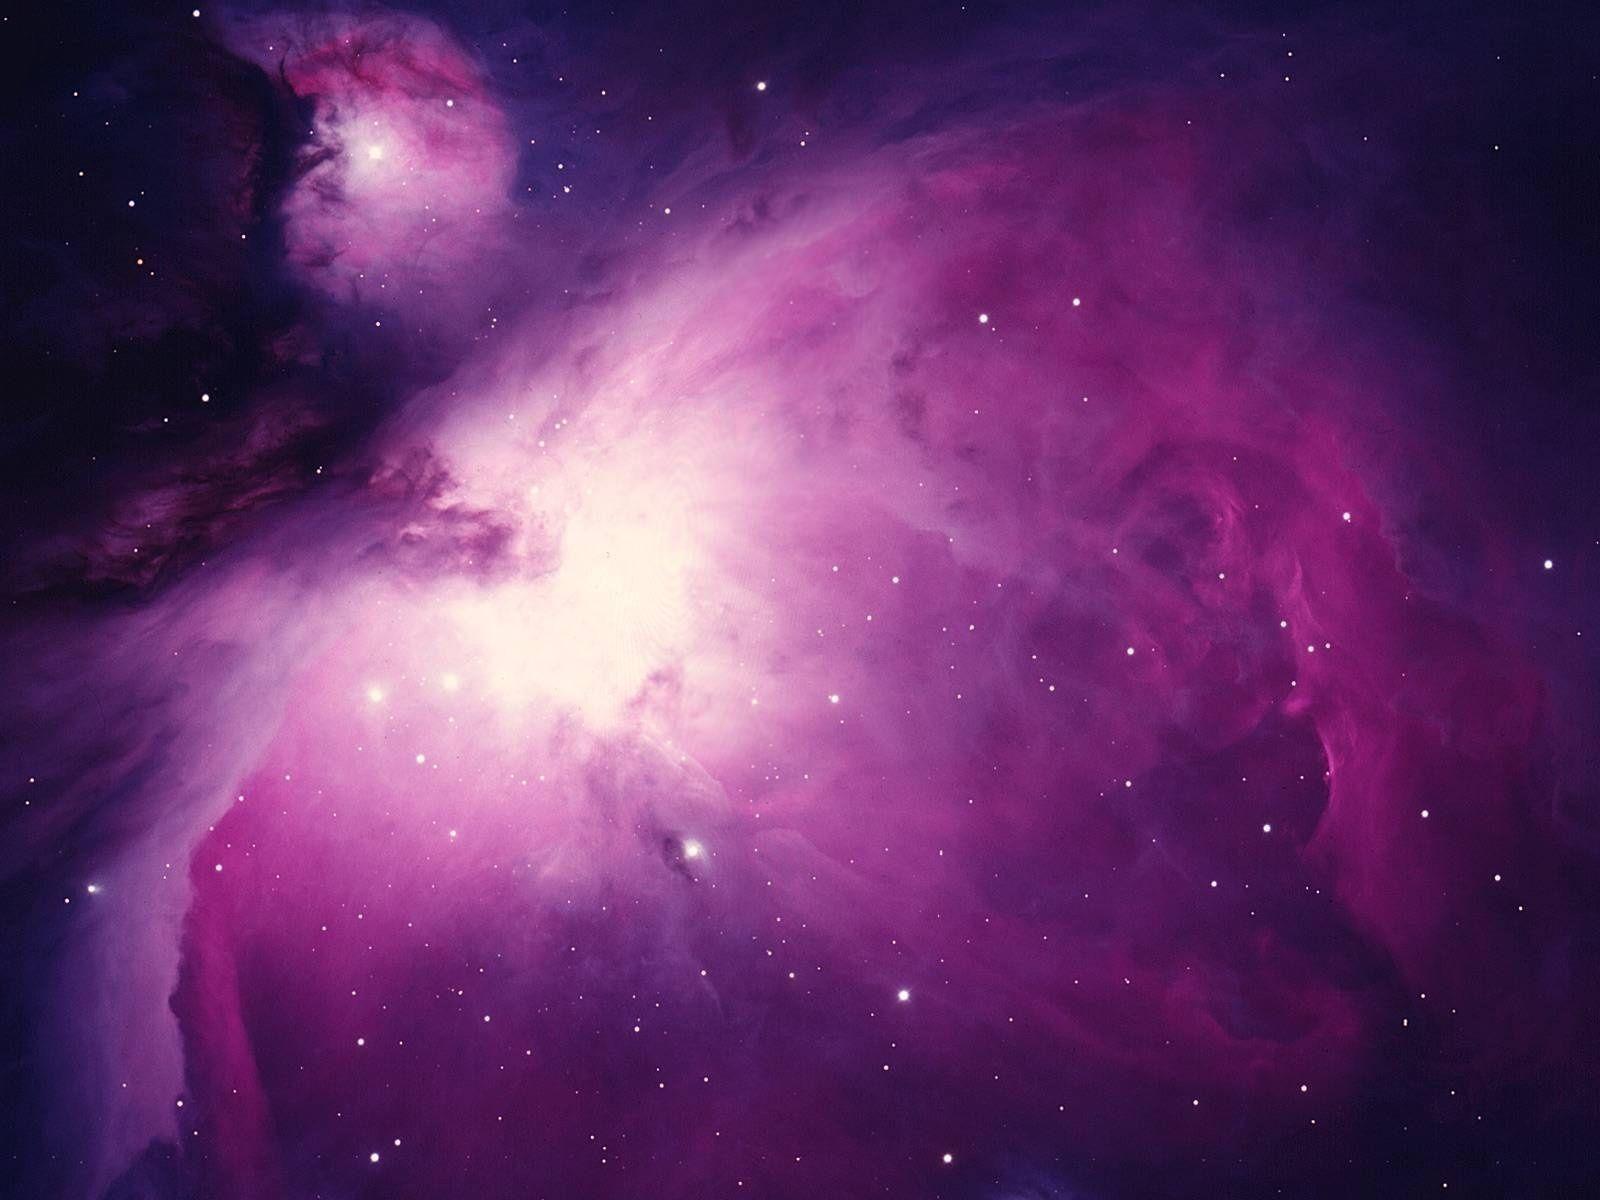 Pastel Galaxy Computer Wallpapers Top Free Pastel Galaxy Computer